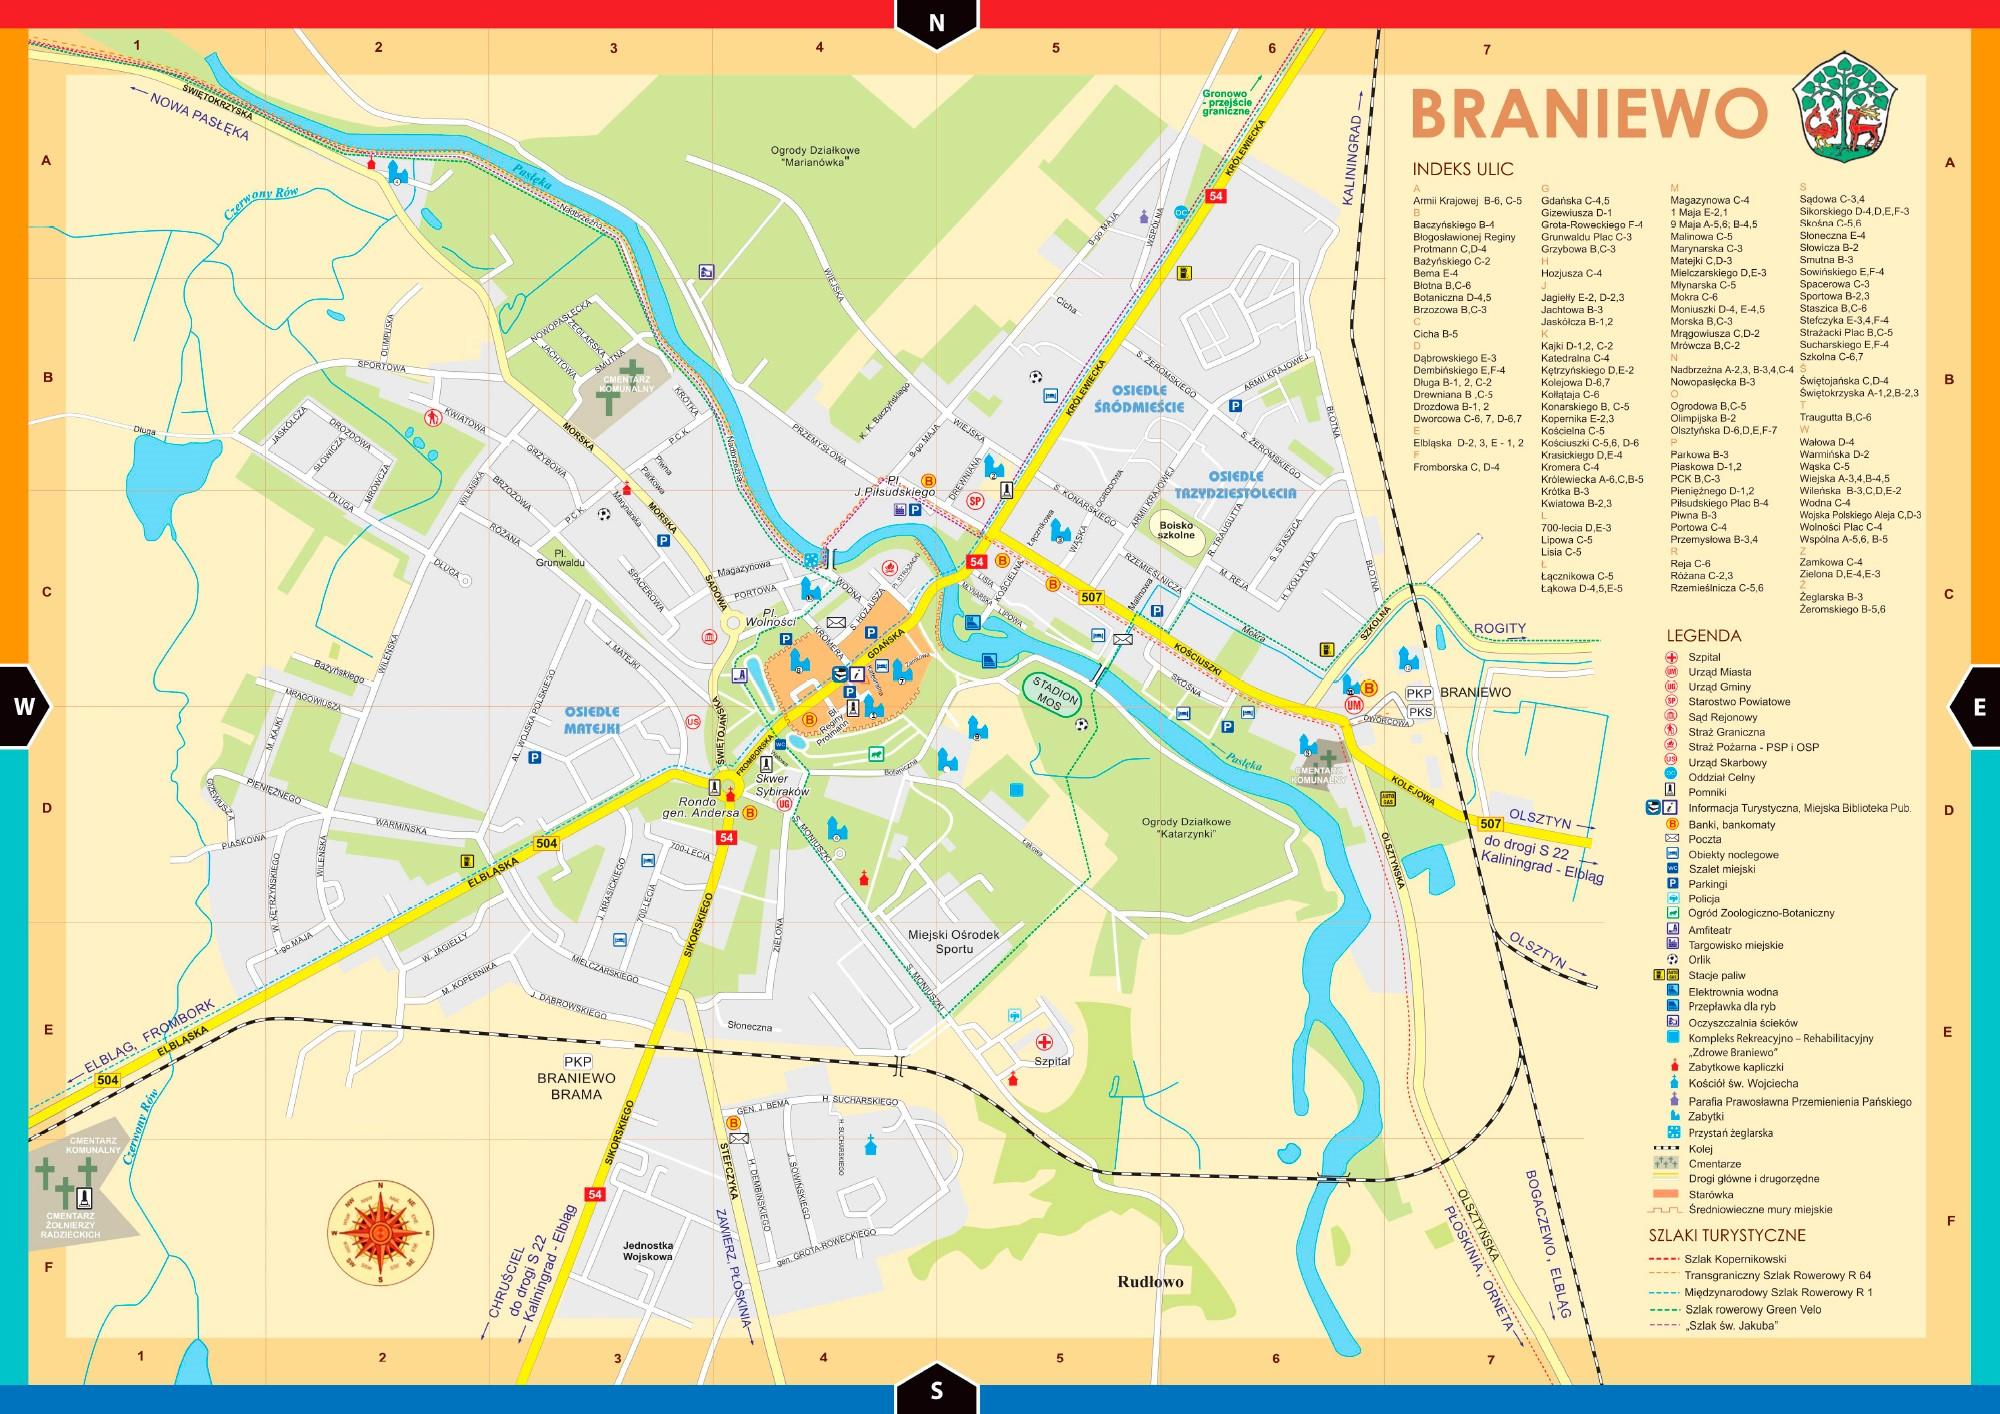 Достопримечательности Бранево на карте